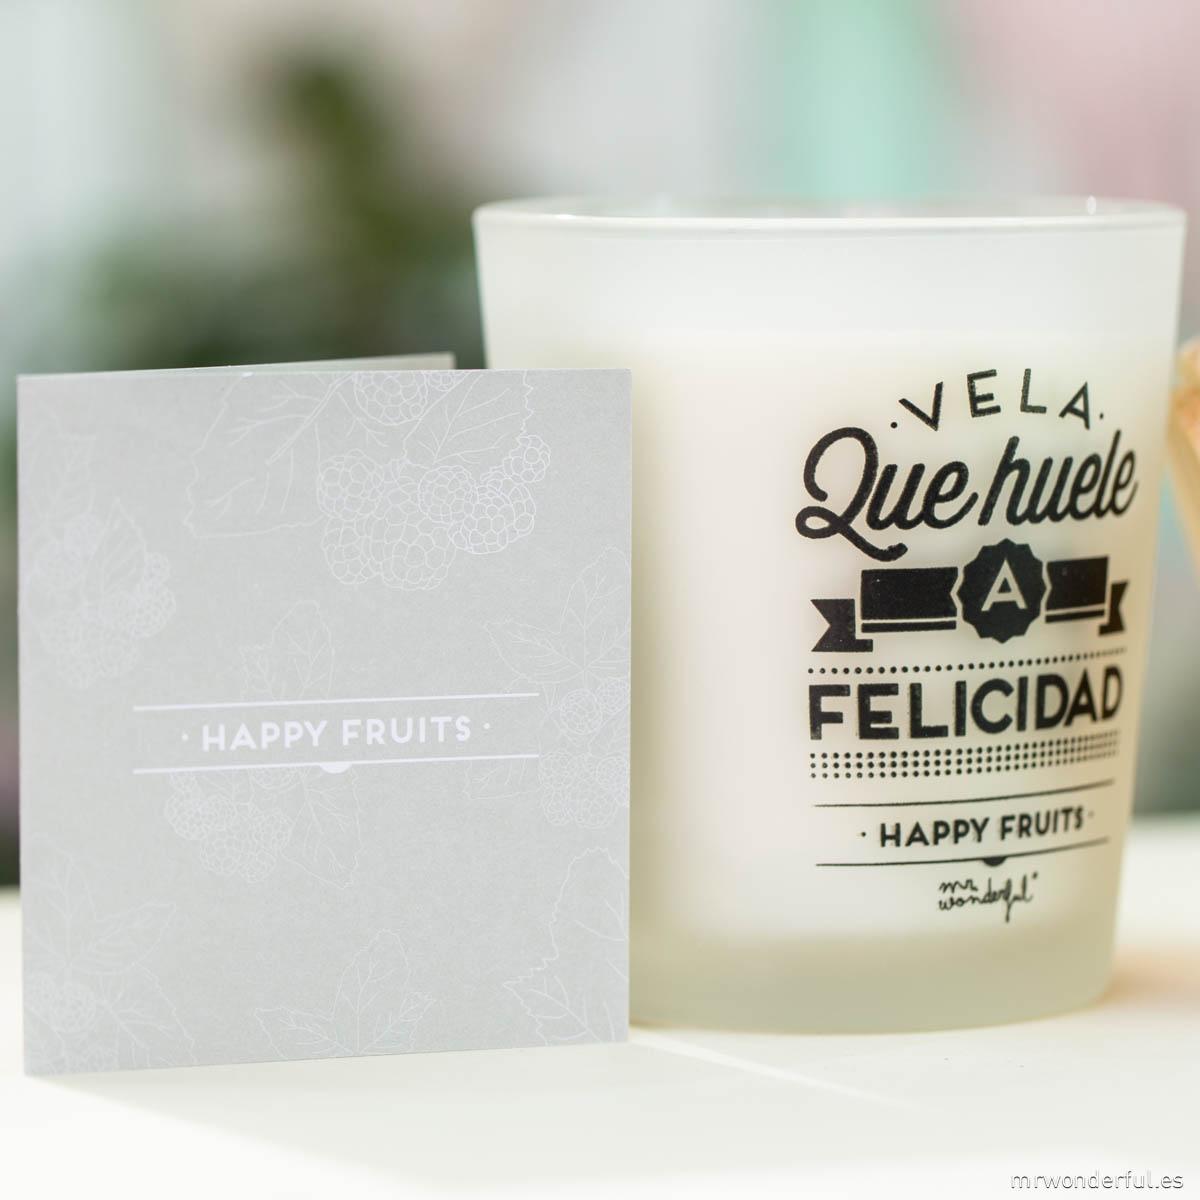 mrwonderful_VELA-04_vela-que-huele-a-felicidad-HAPPY-FRUITS-17